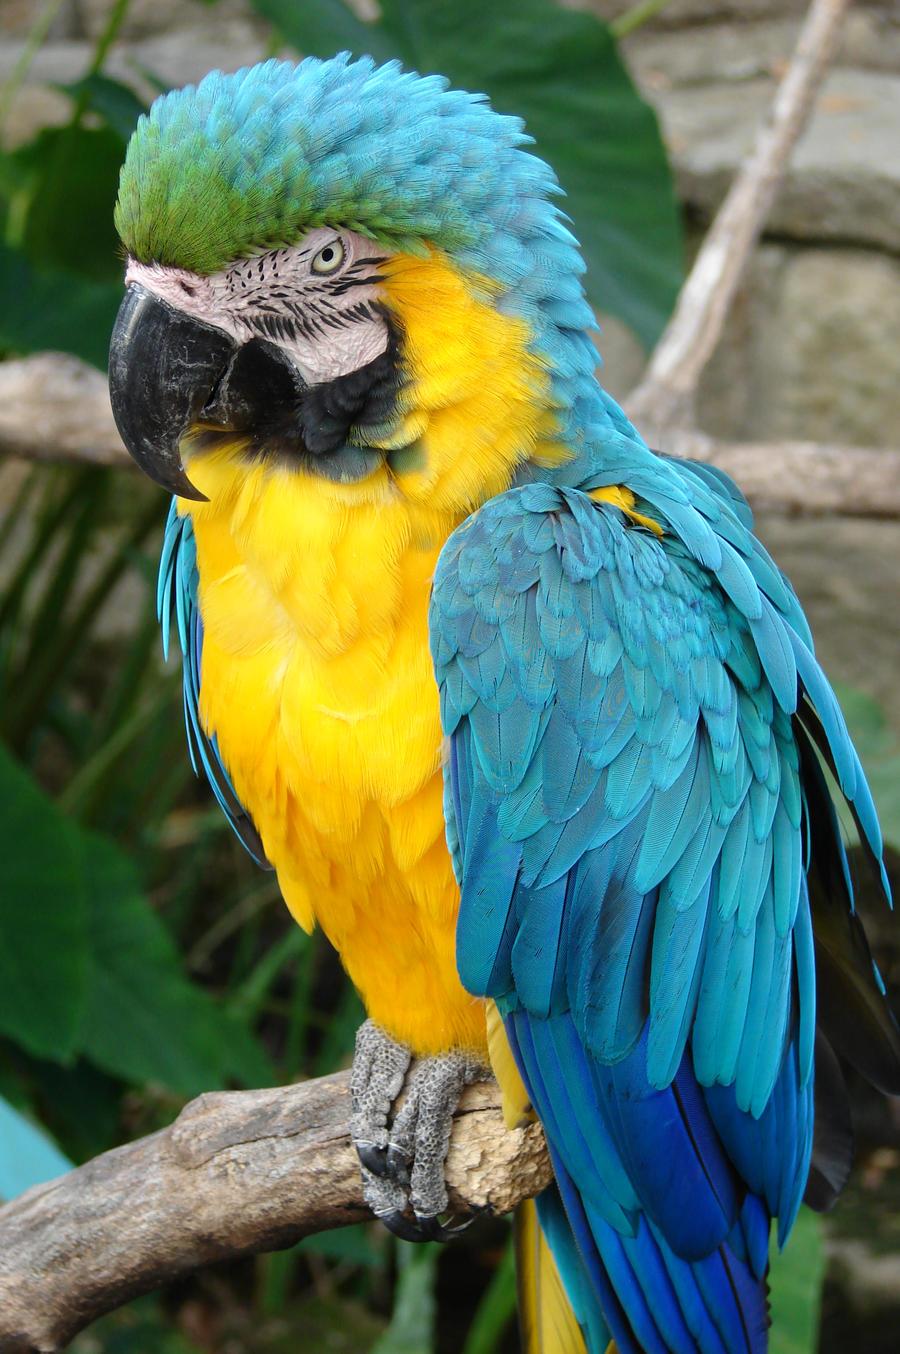 pin blue macaw bird - photo #20